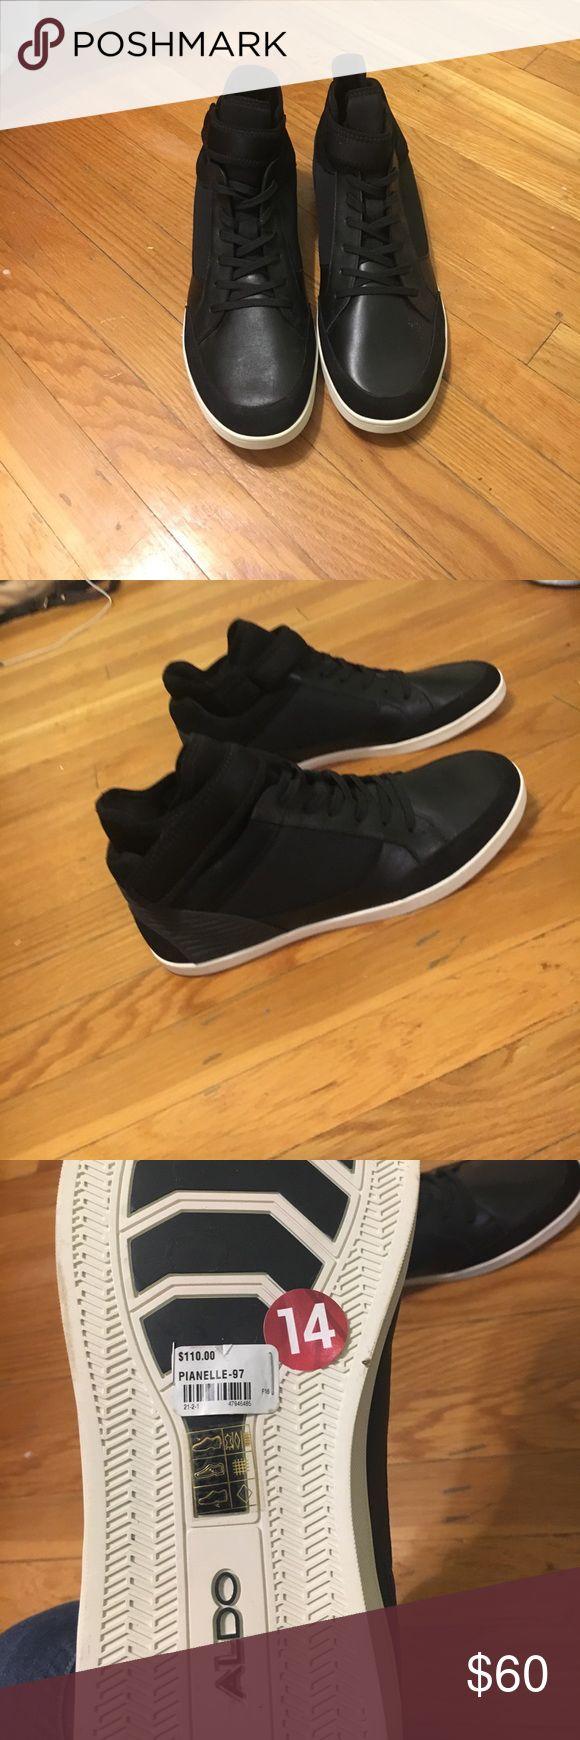 Aldo men's pianelle sneaker sz 14 New Never worn with tags Aldo Shoes Athletic Shoes